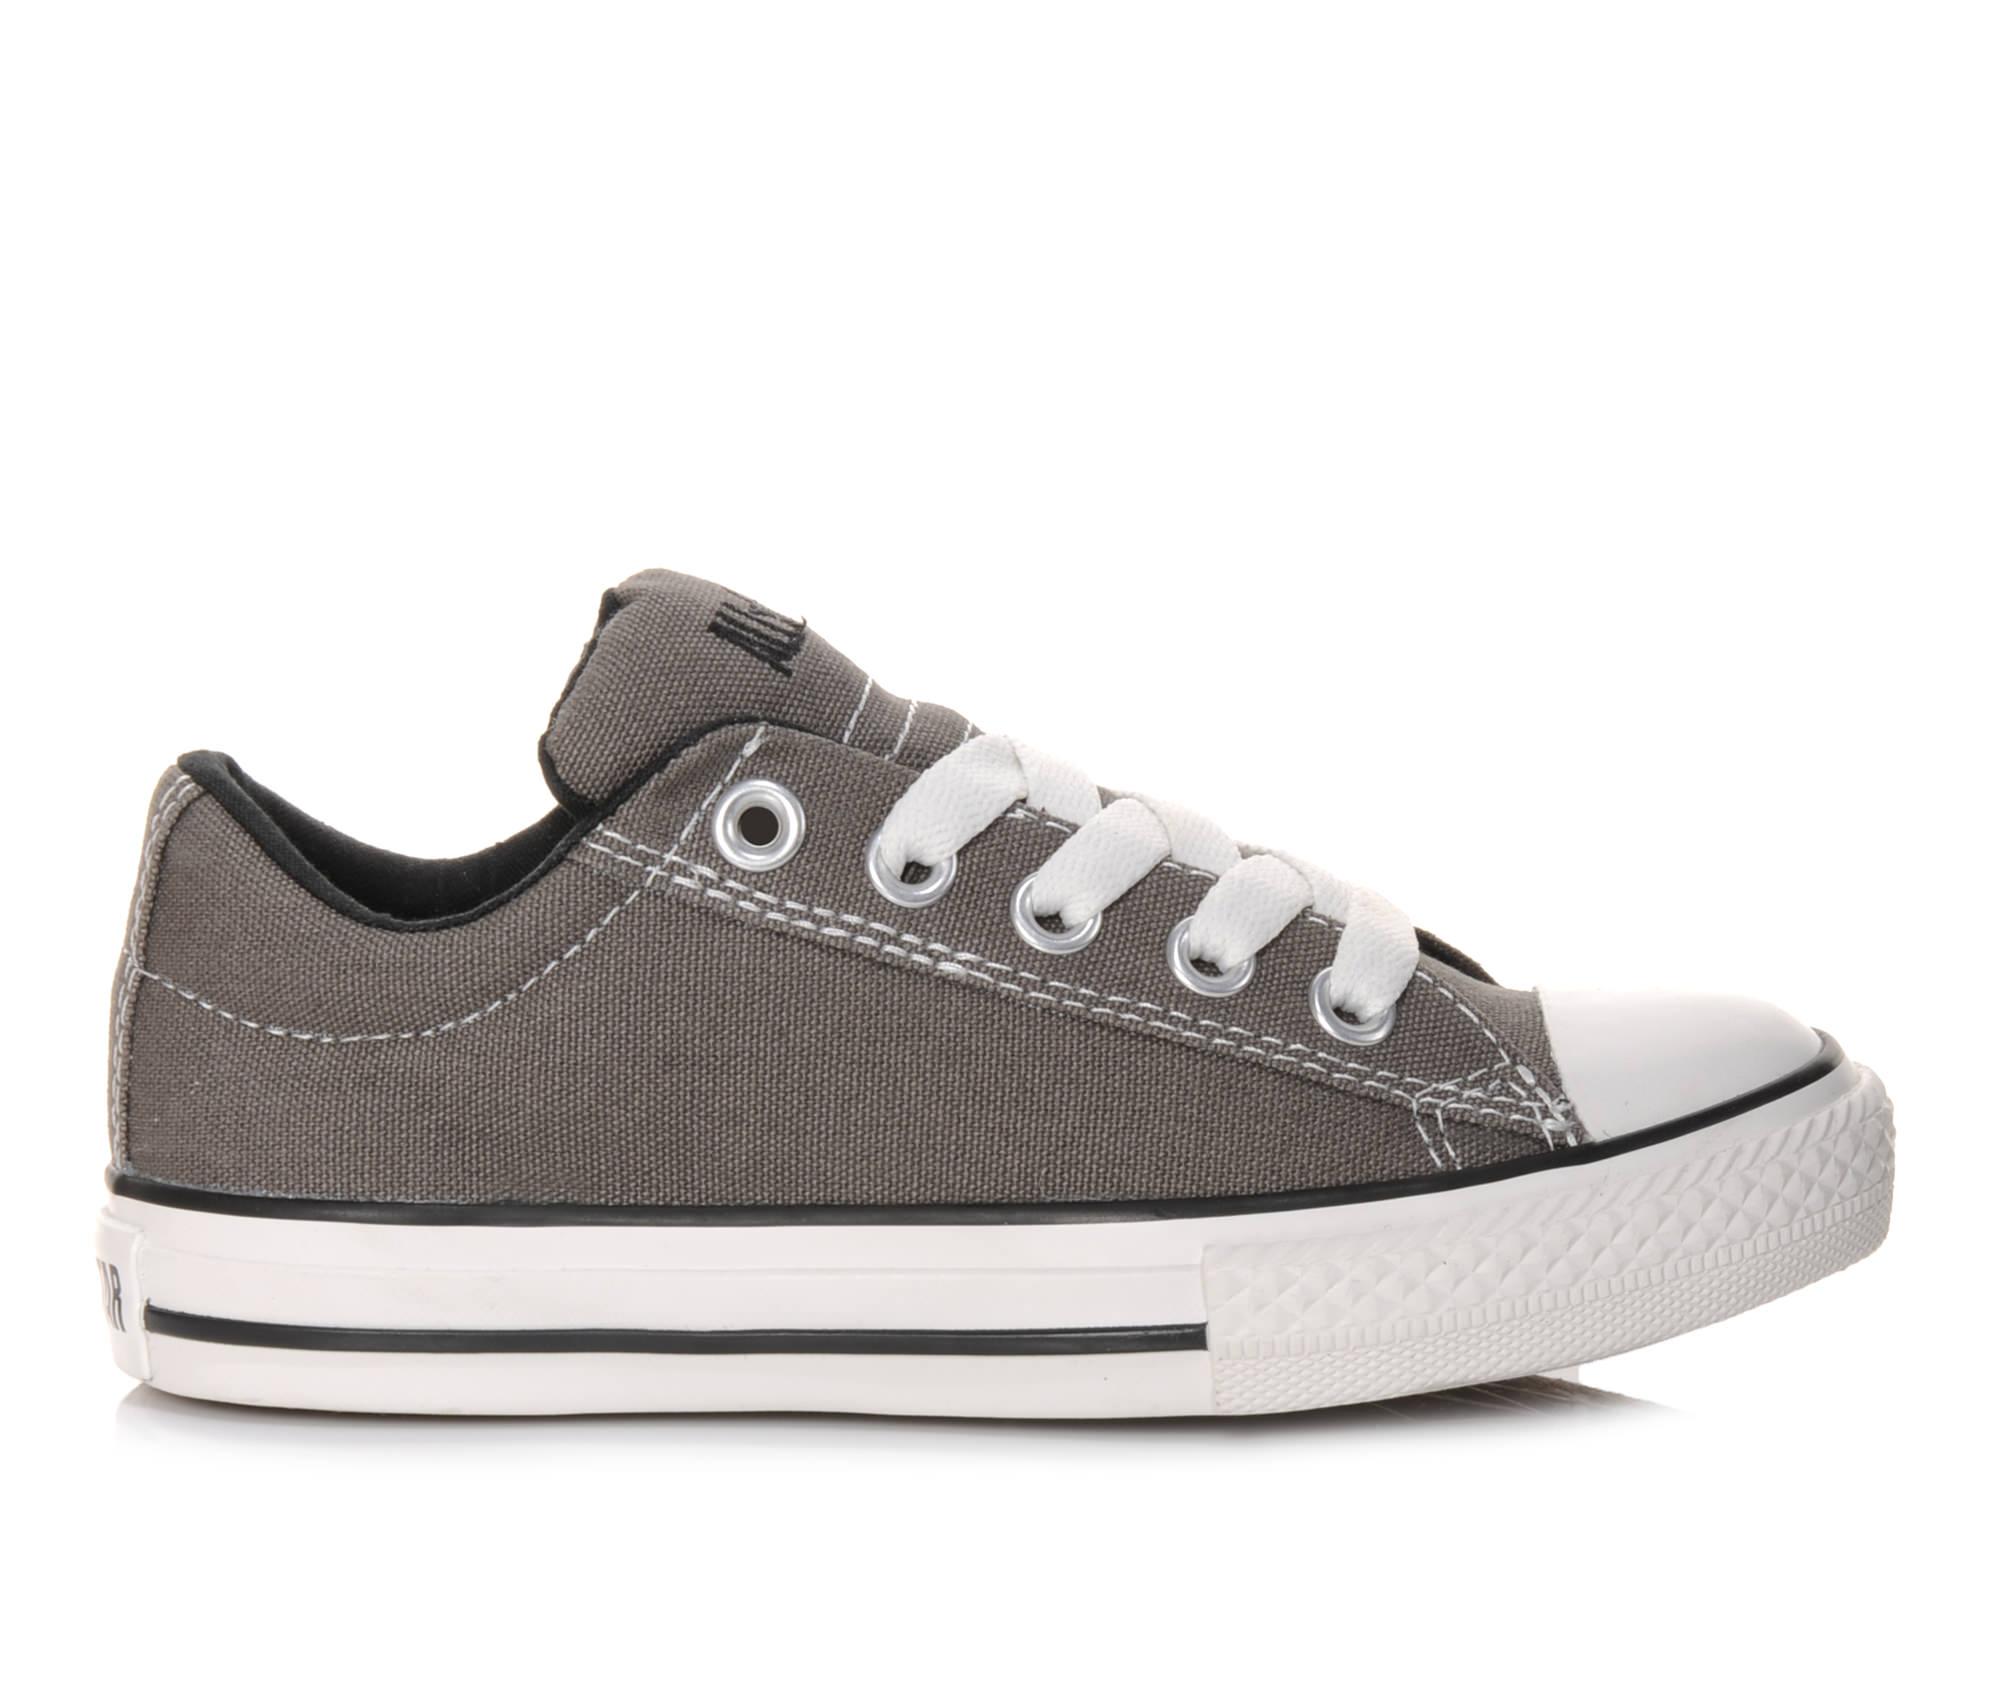 Girls' Converse Chuck Taylor All Star Street Ox Sneakers (Grey)